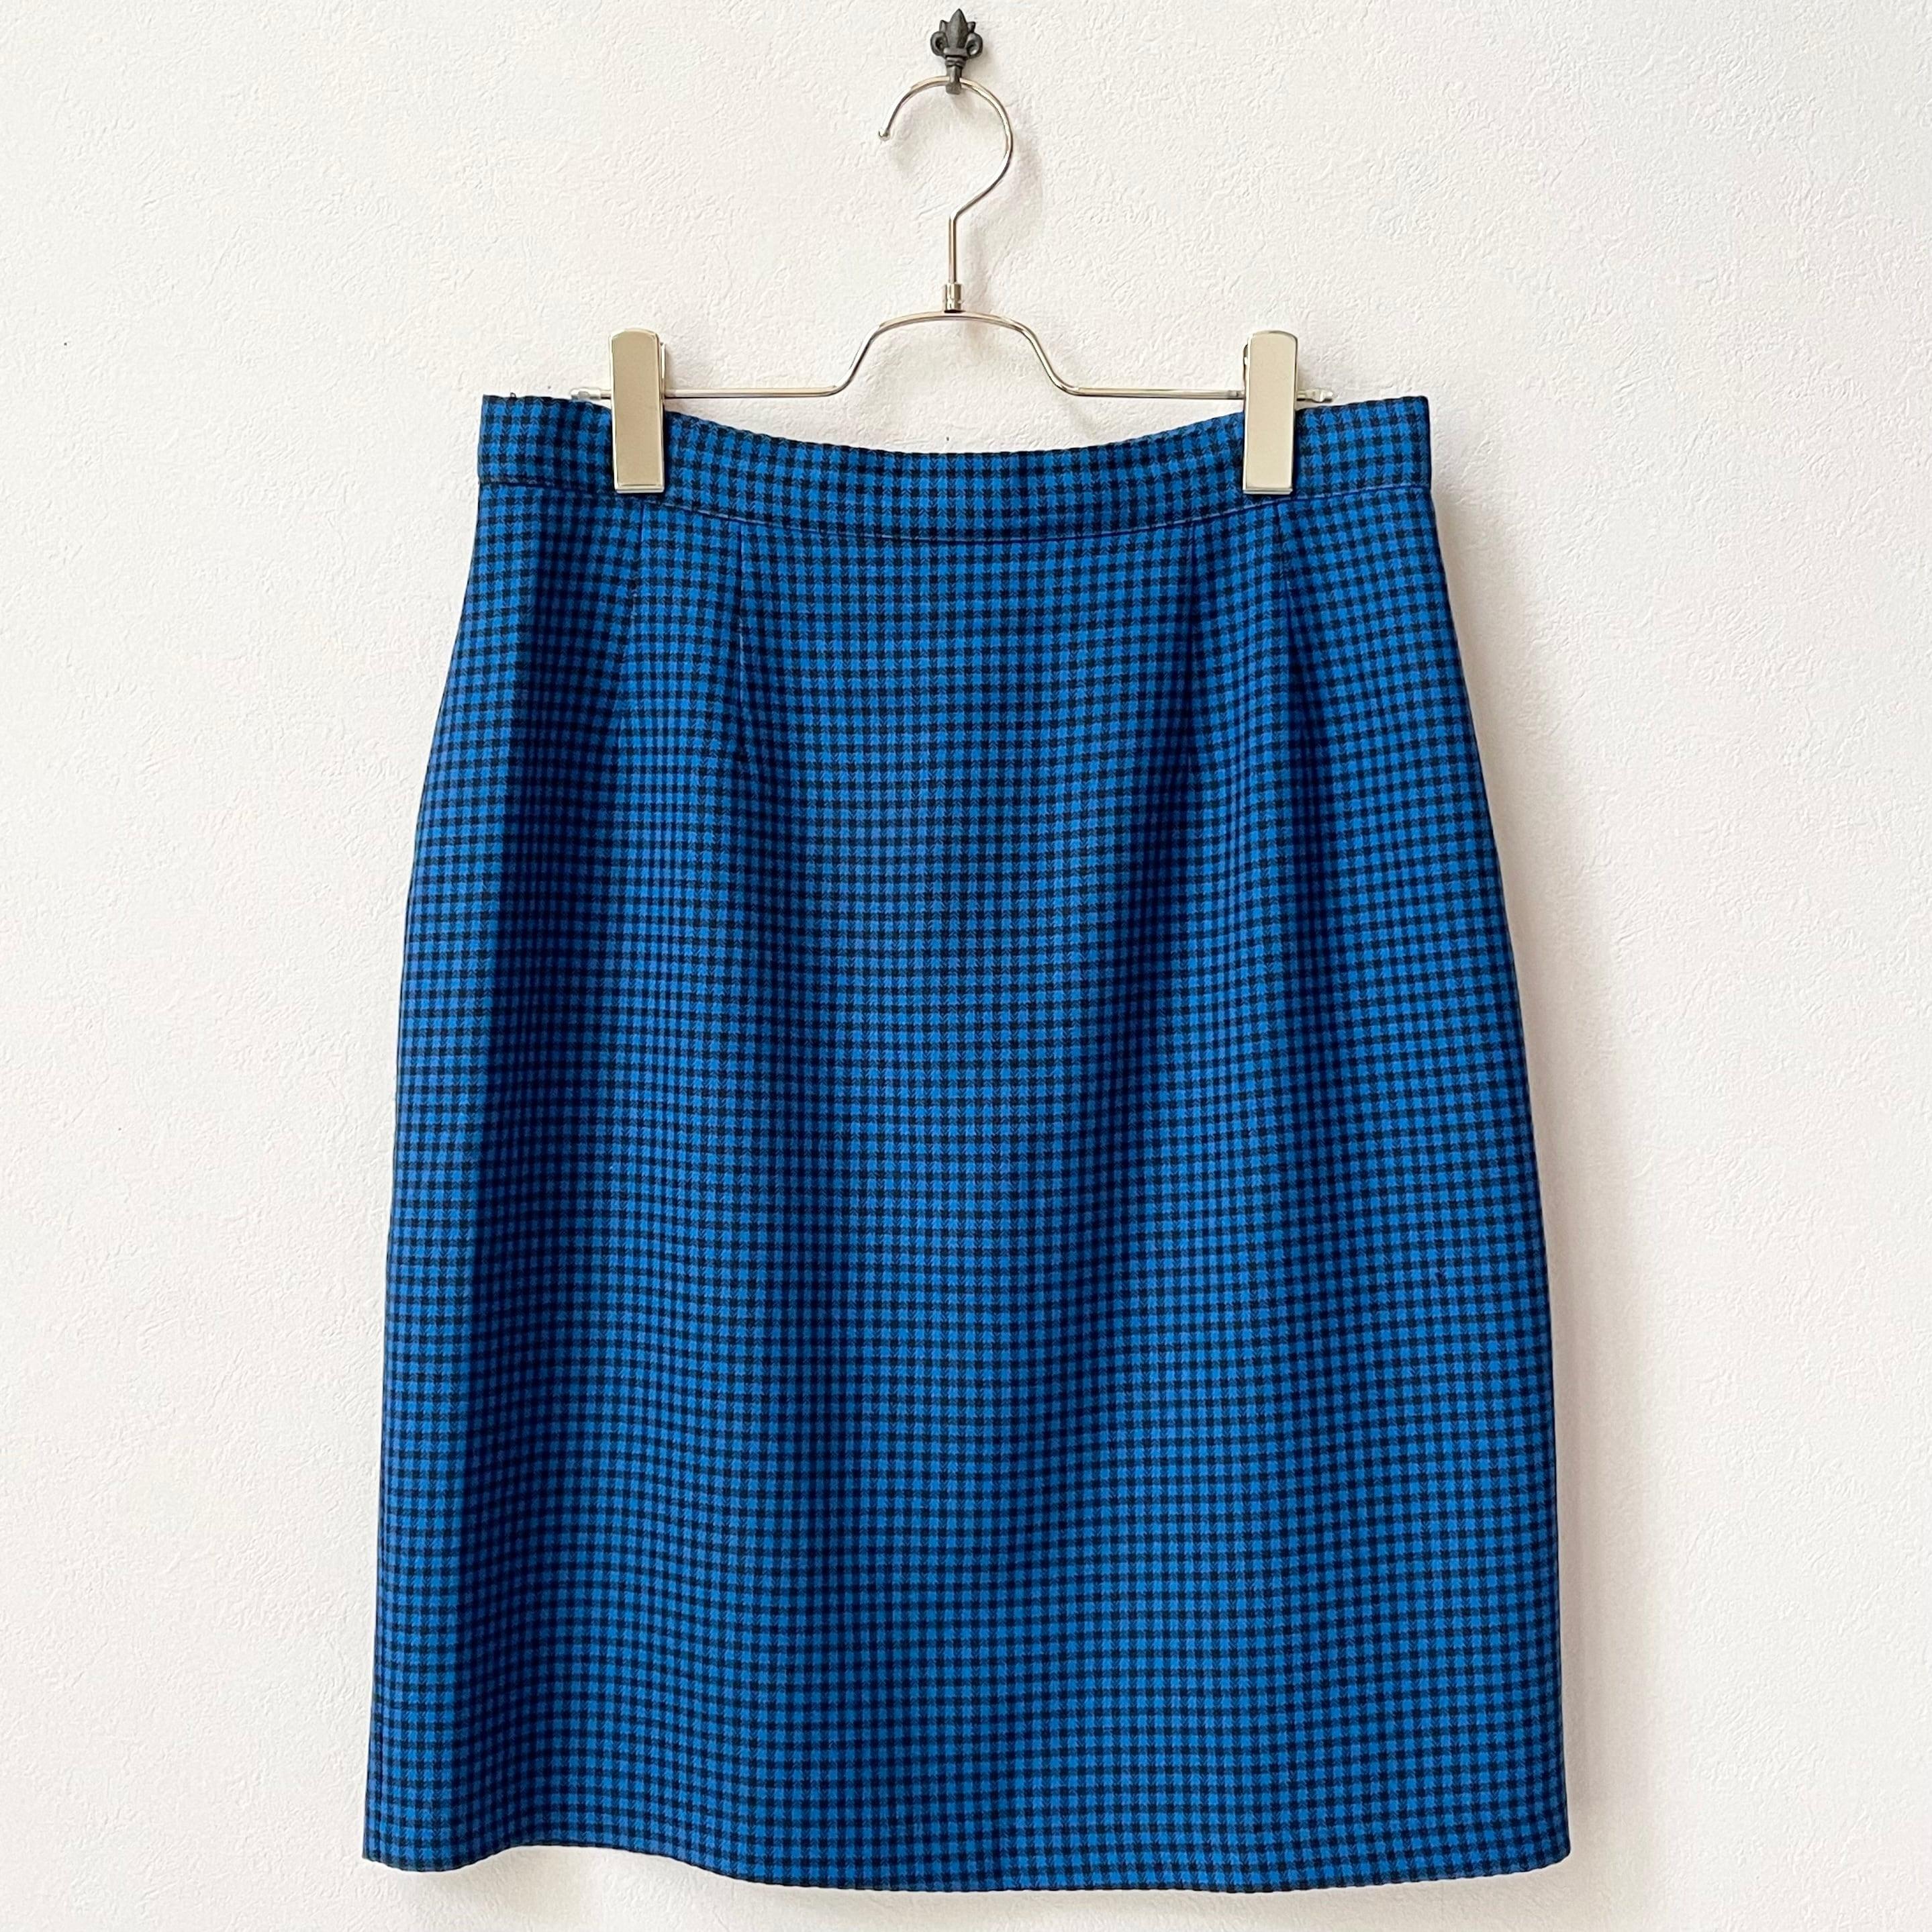 CAROLE WREN 80年代 USA製 ギンガムチェック柄 スカート 日本LL